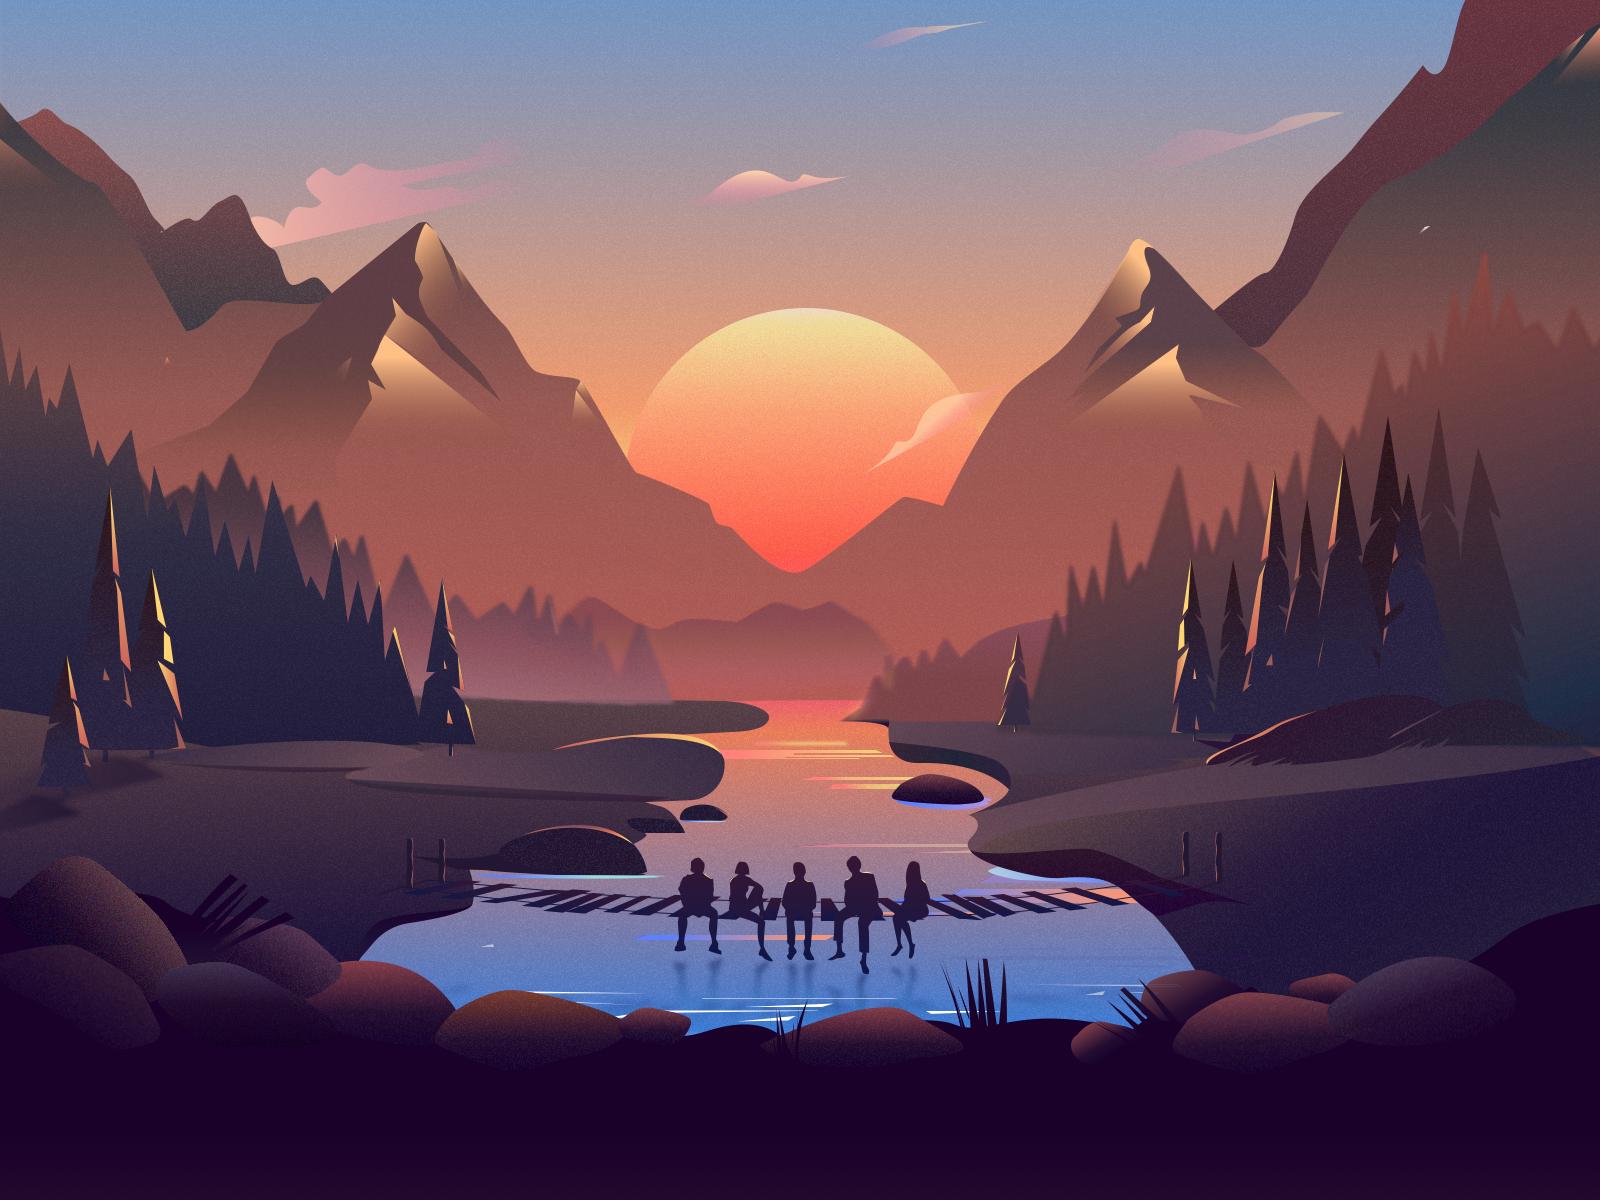 Afterglow Desktop Wallpaper Art Art Wallpaper Landscape Illustration